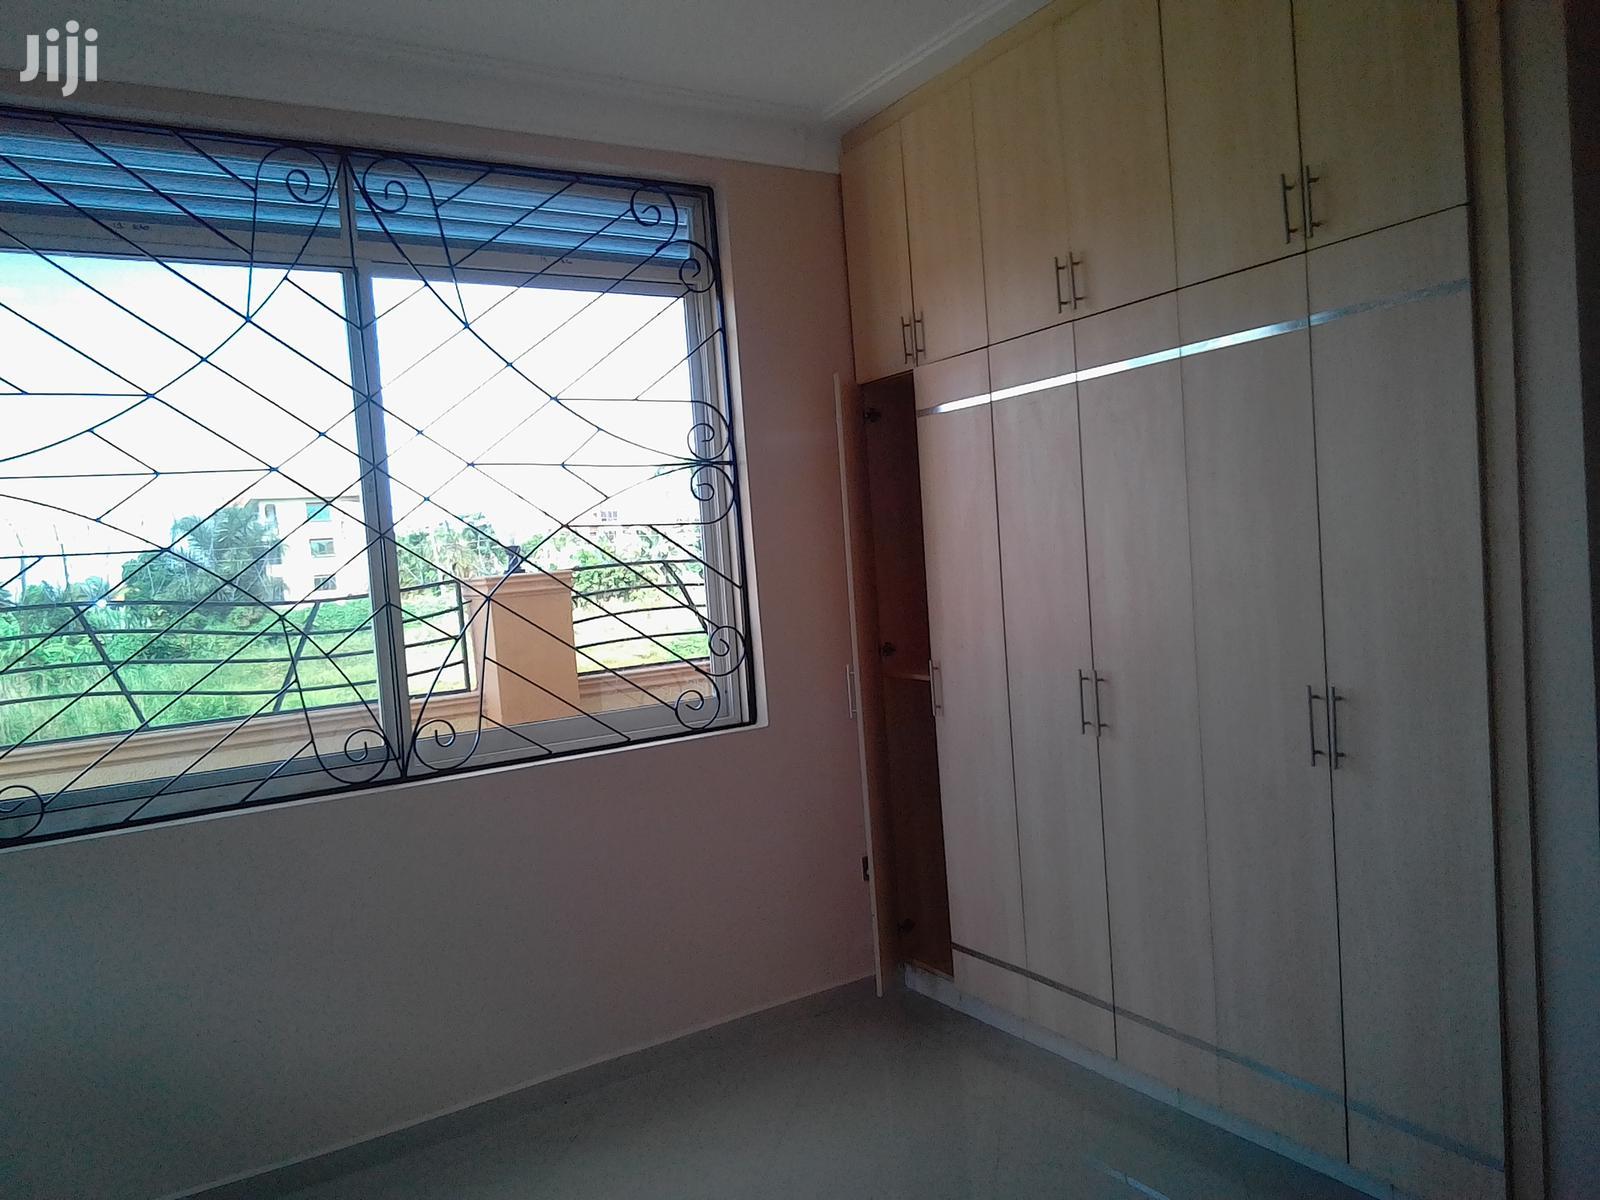 Brand New Three Bedroom House In Kira For Sale | Houses & Apartments For Sale for sale in Kampala, Central Region, Uganda